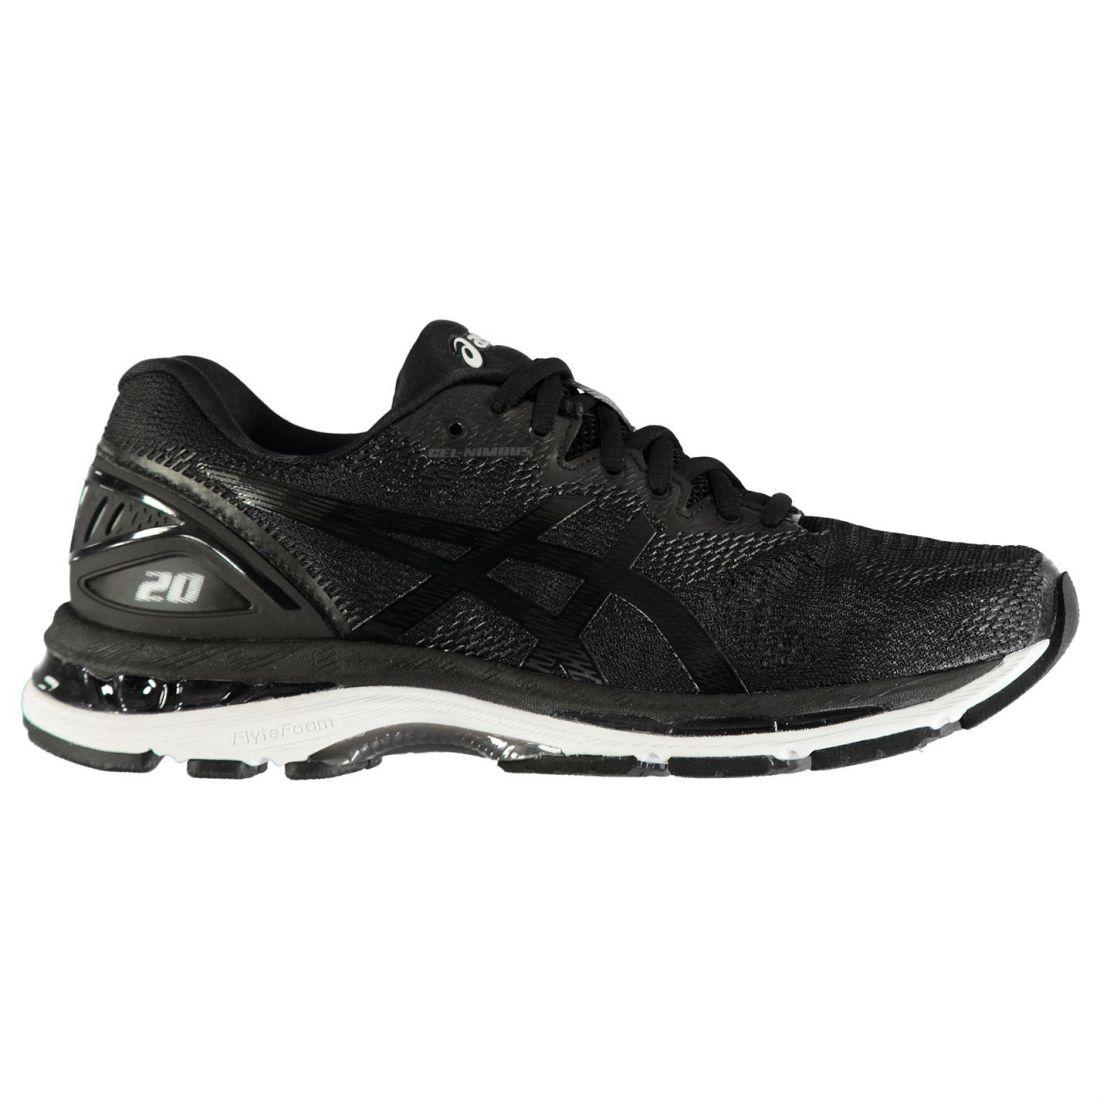 b2f87dad8cb0 Asics Mens Gel Nimbus 20 Running Shoes Road Lightweight Ortholite